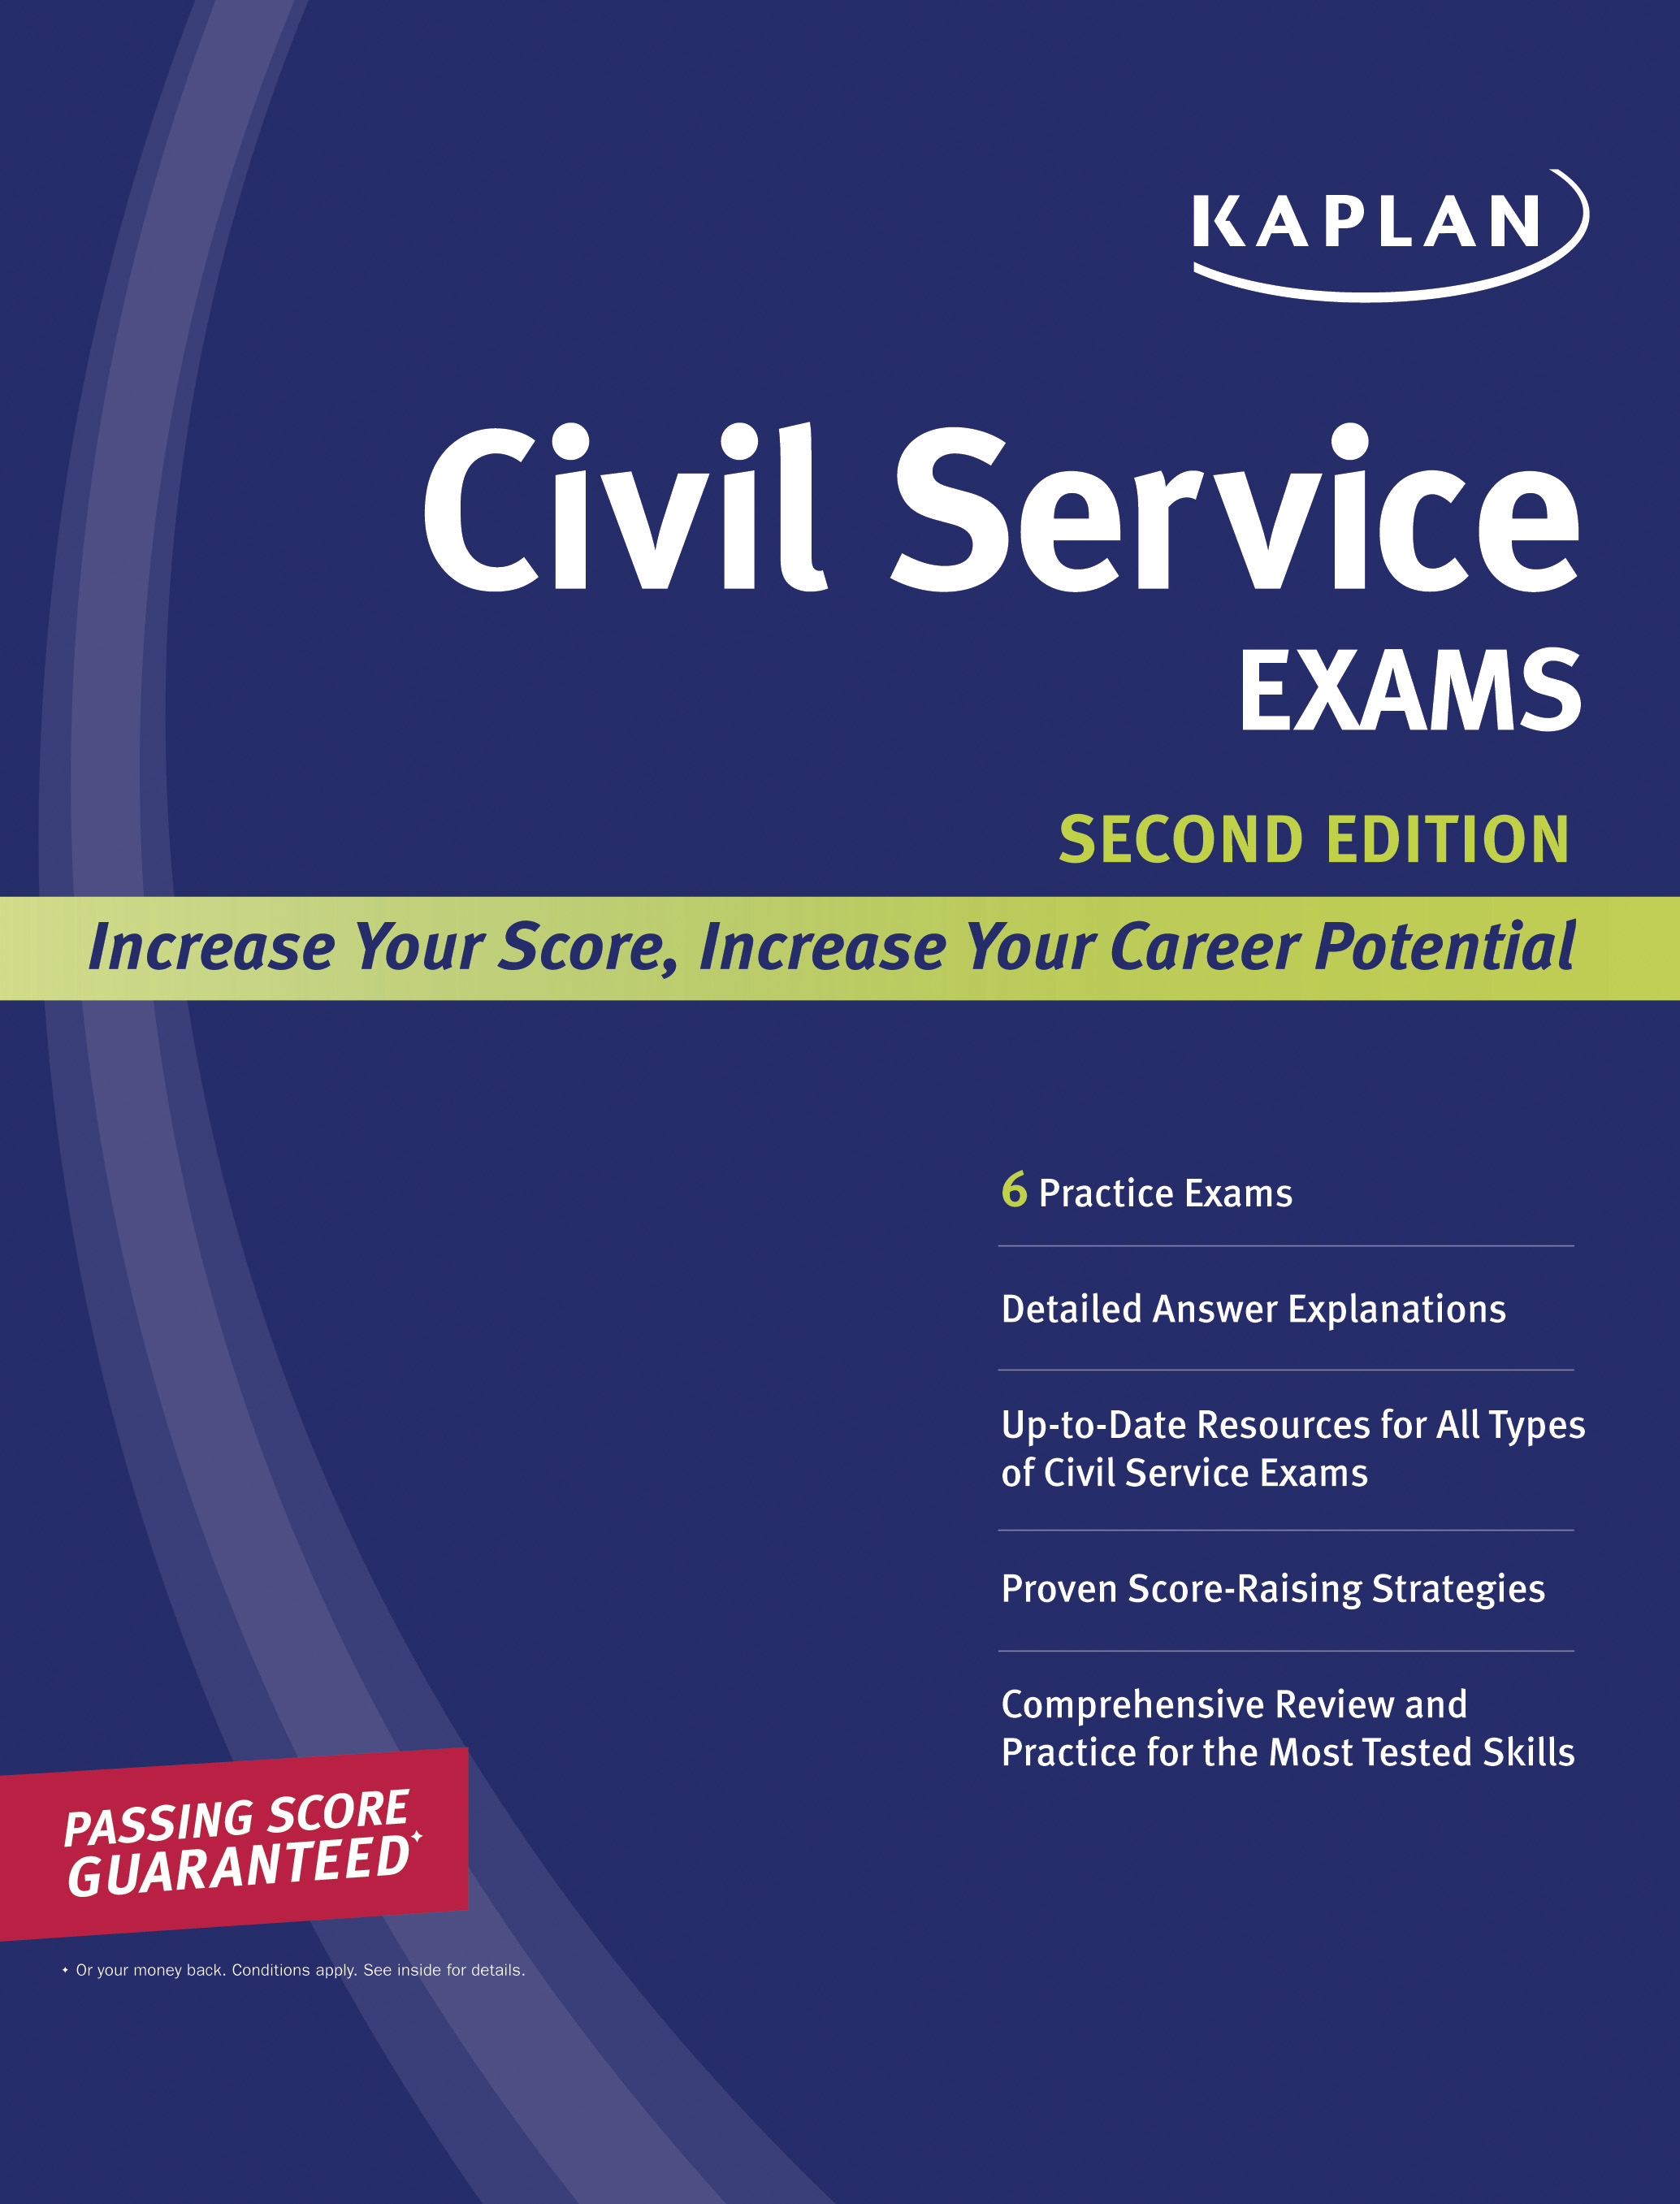 Book Cover Image (jpg): Kaplan Civil Service Exams